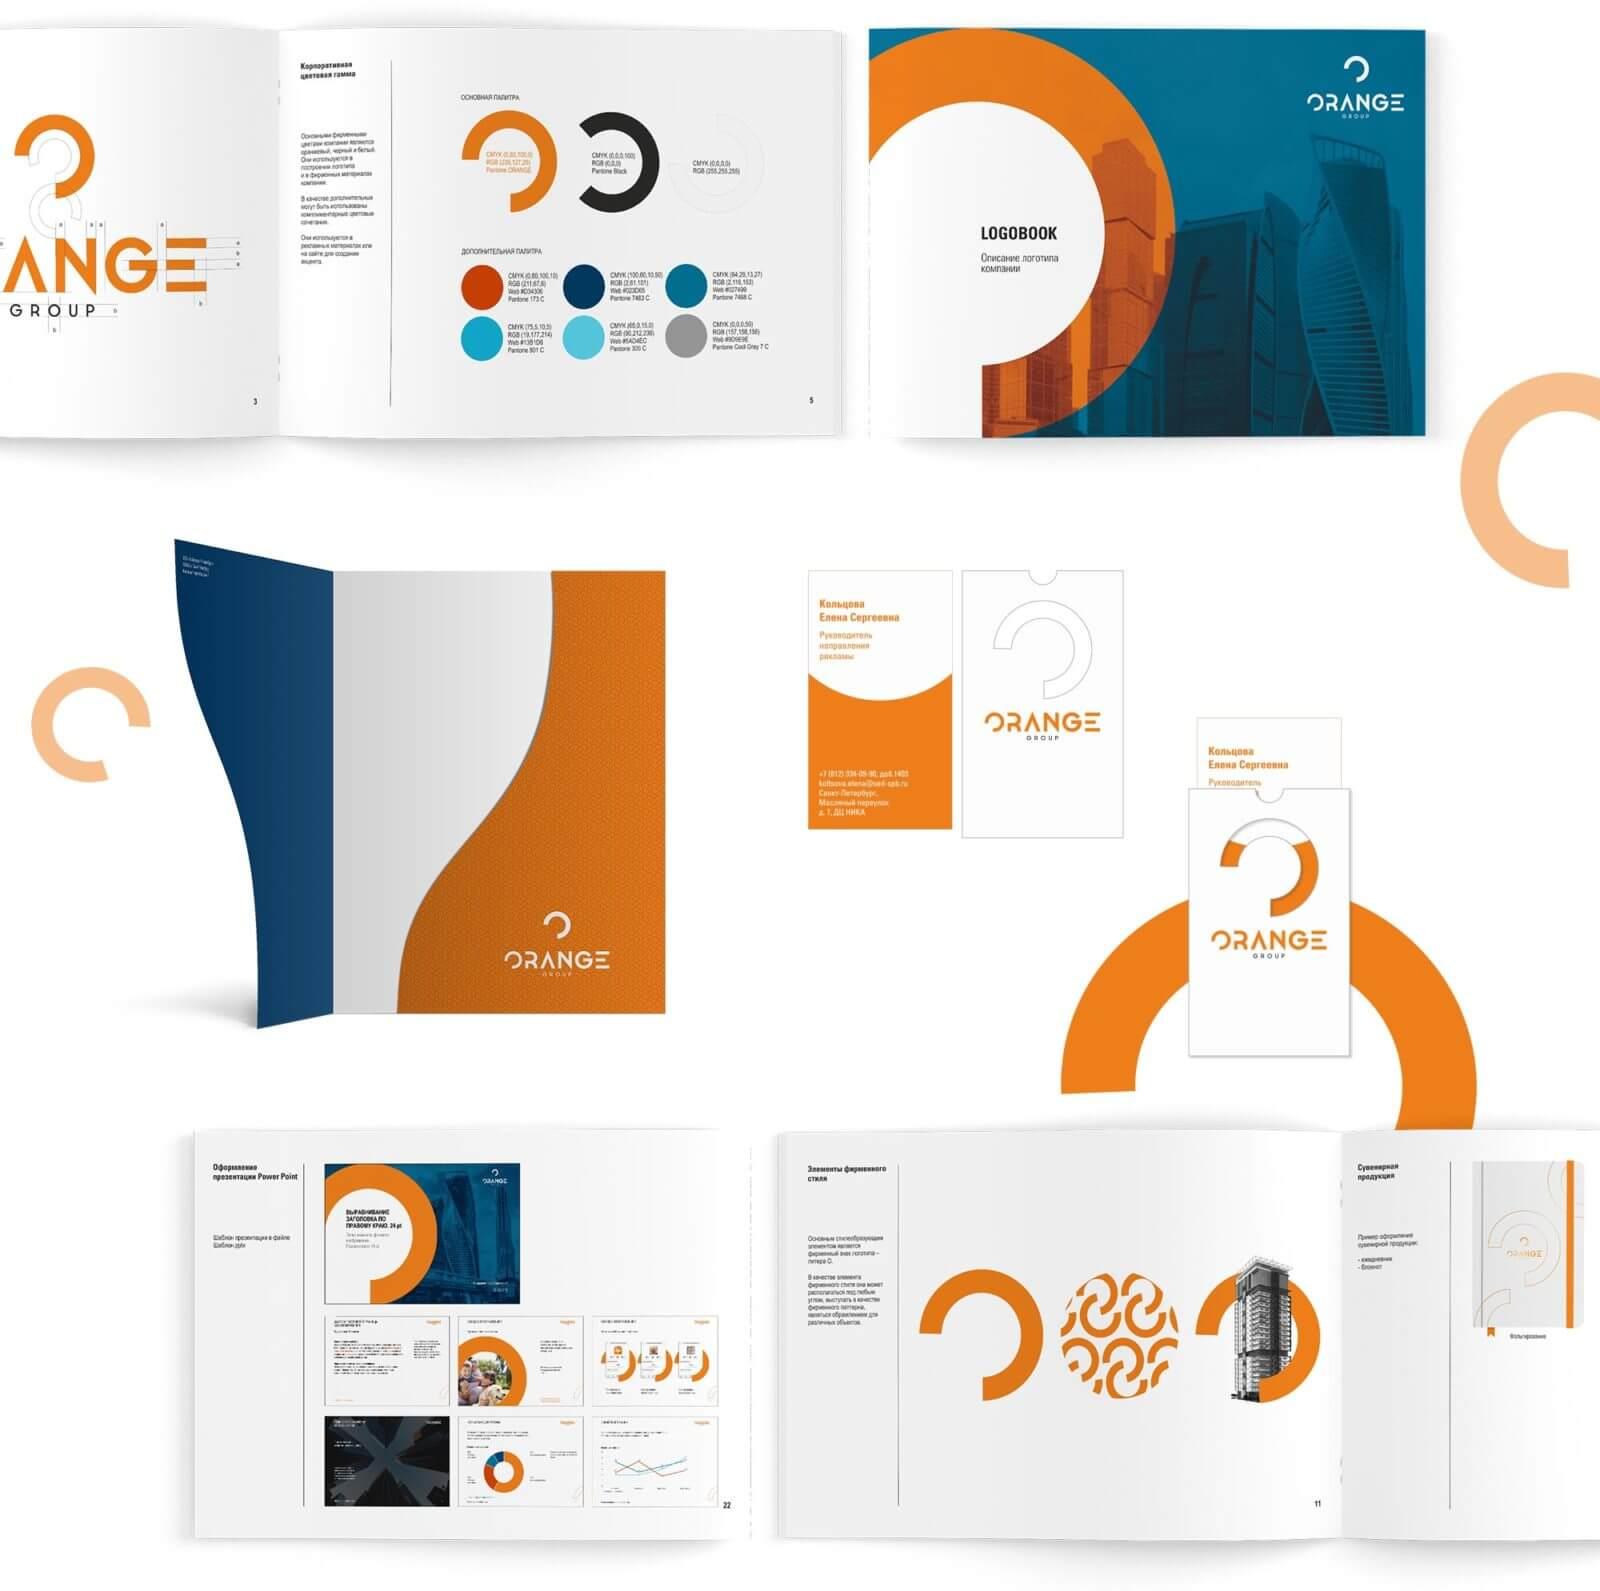 Брендинг группы компаний Orange